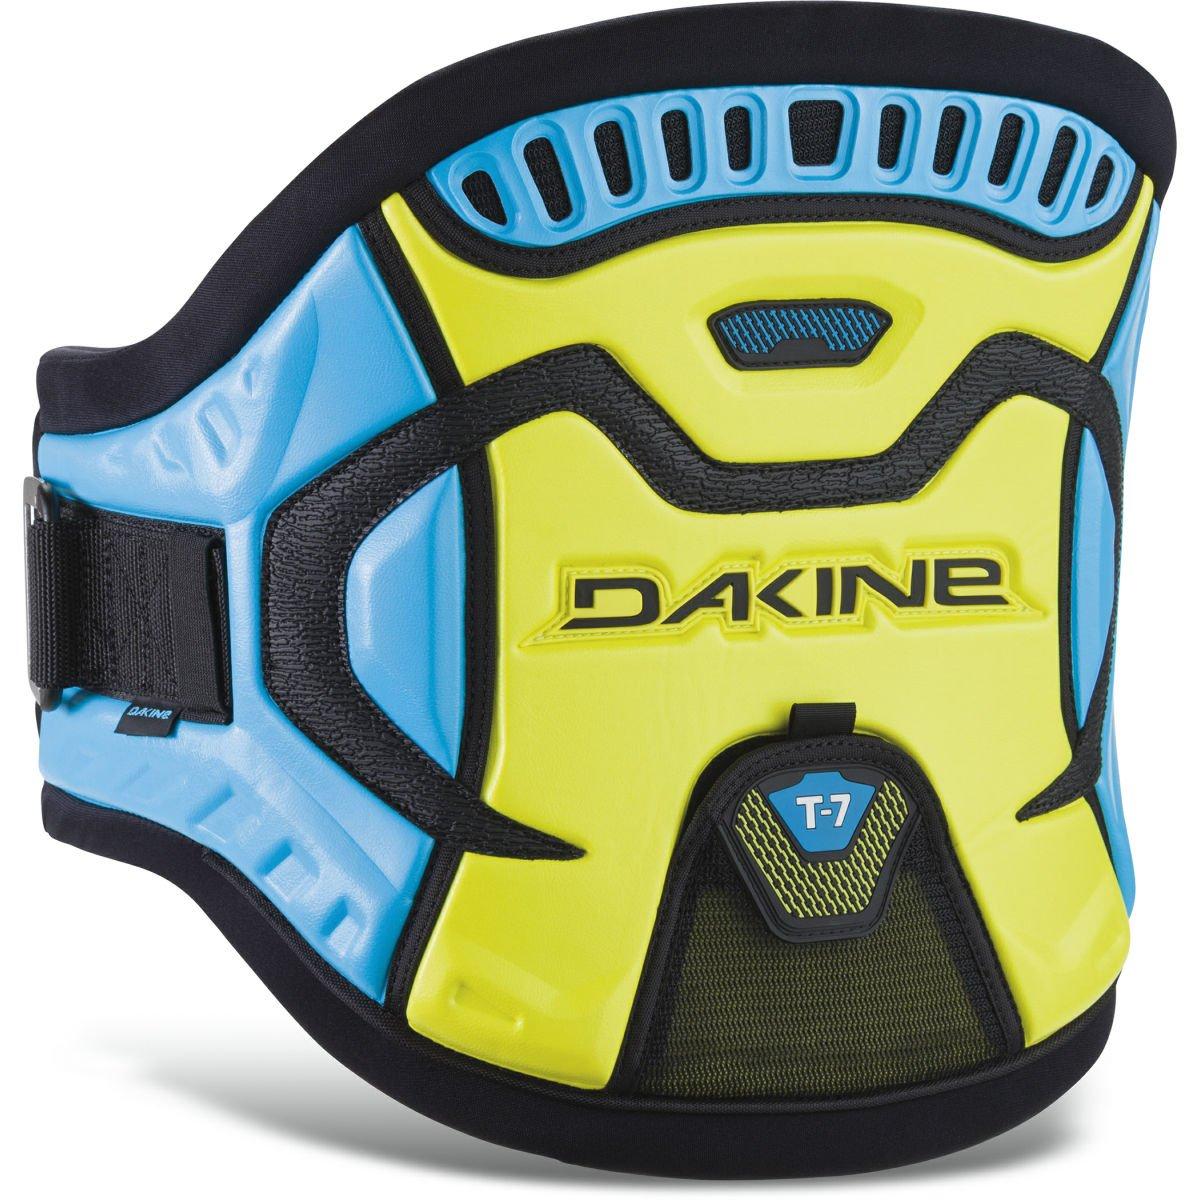 DaKine T7 Waist Harness